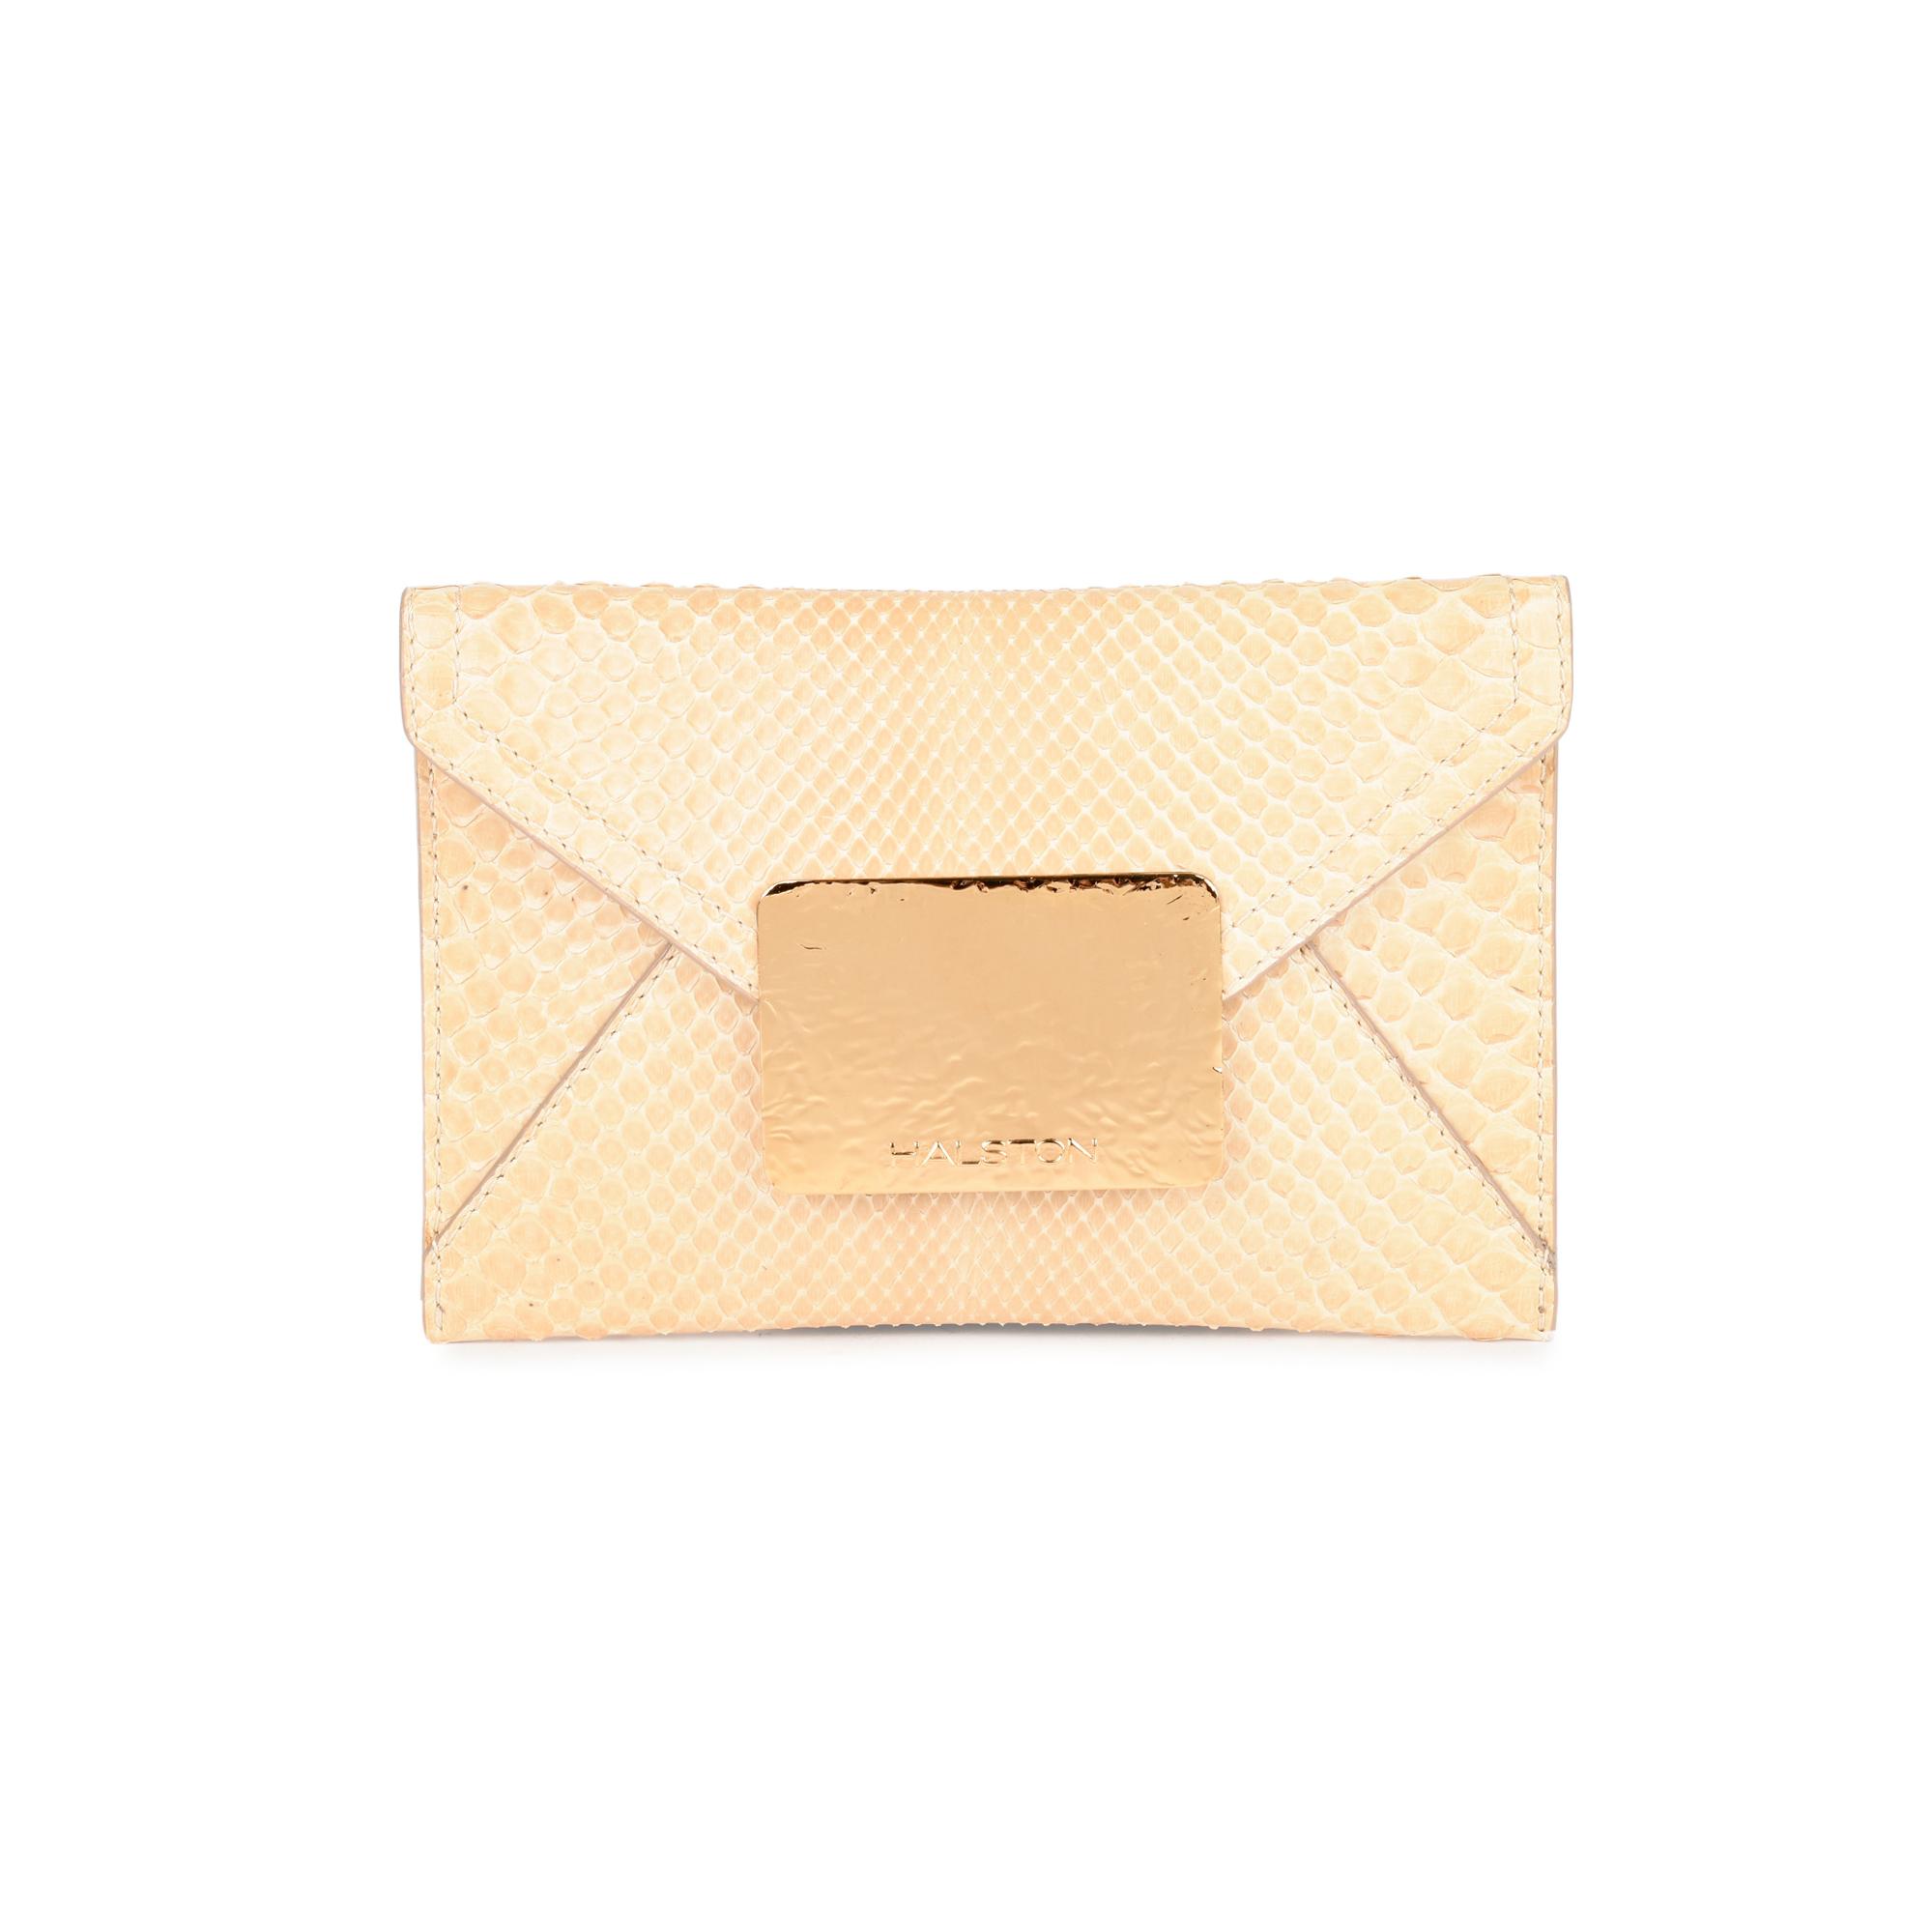 67374adac0 Authentic Second Hand Halston Snakeskin Envelope Clutch (PSS-414-00004)